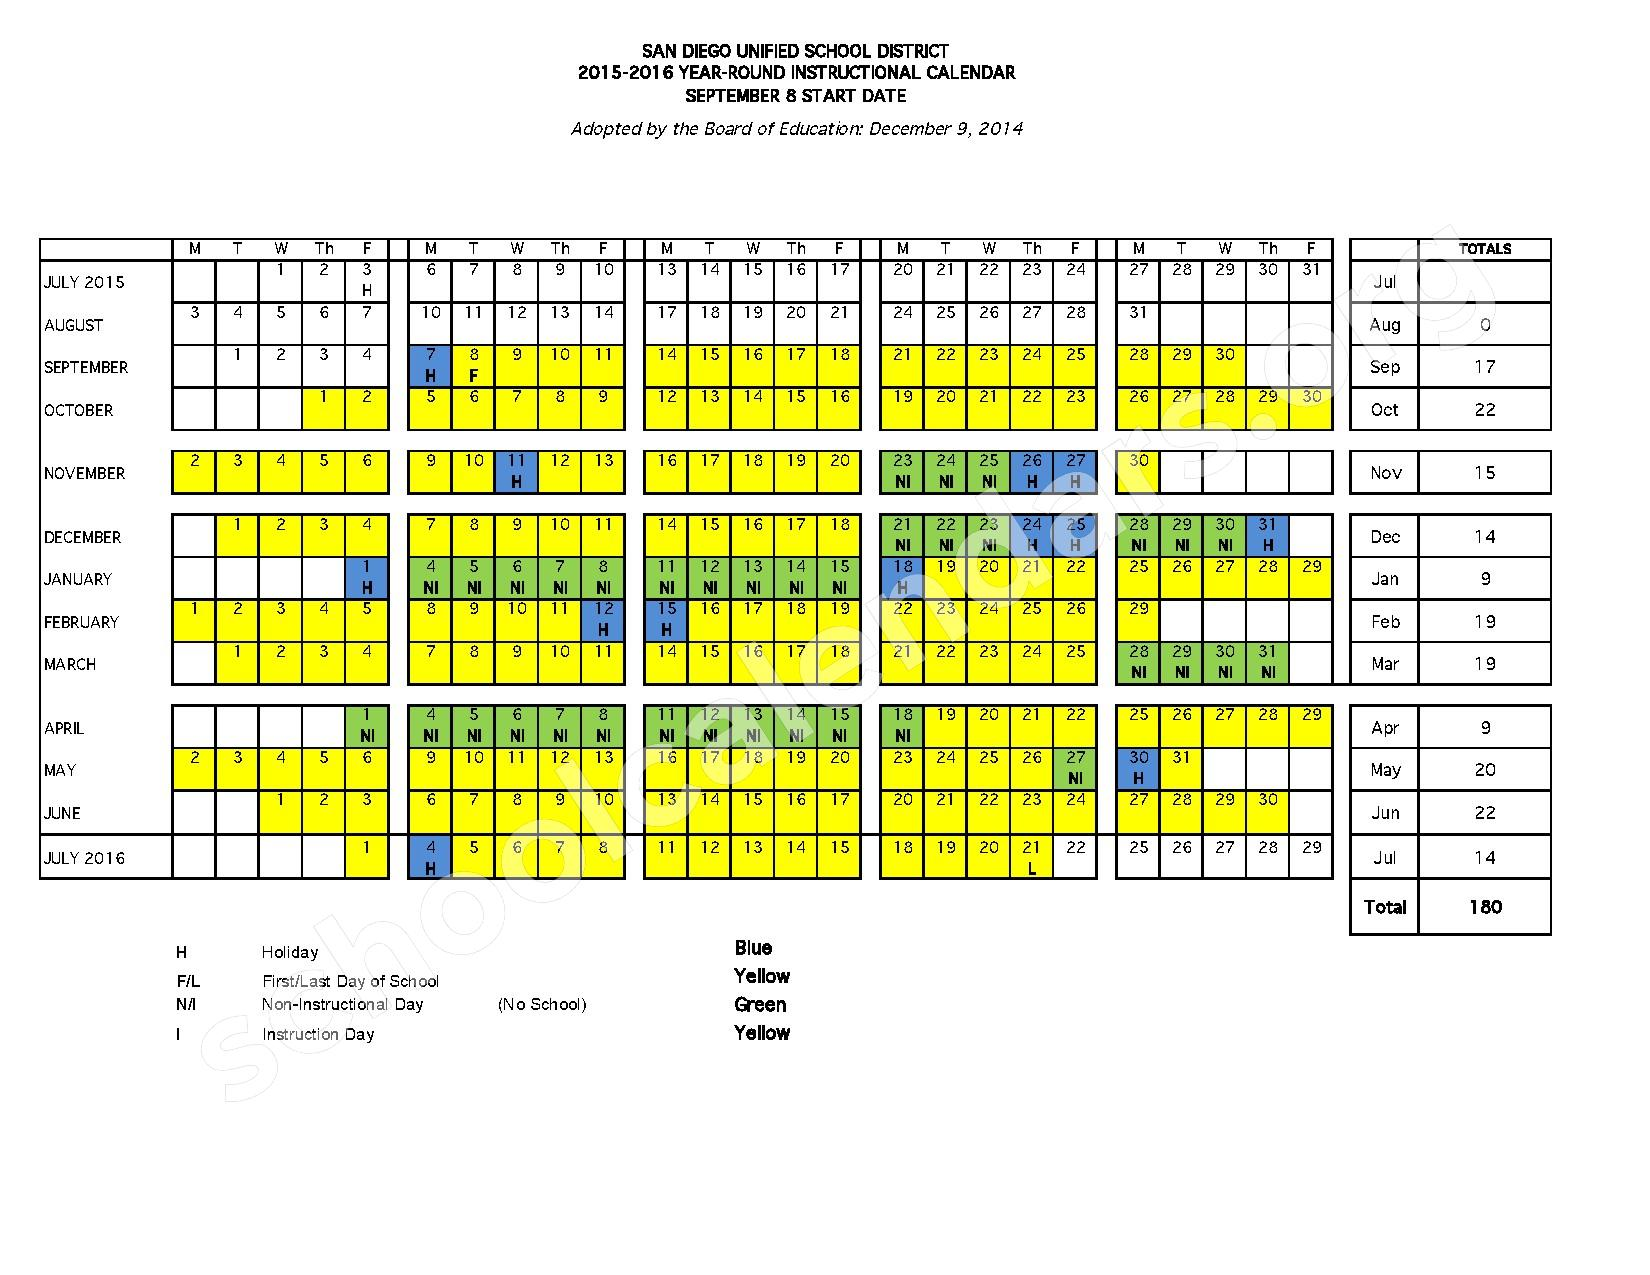 Year Round Calendar Durham Public Schools : Year round calendar birney elementary school